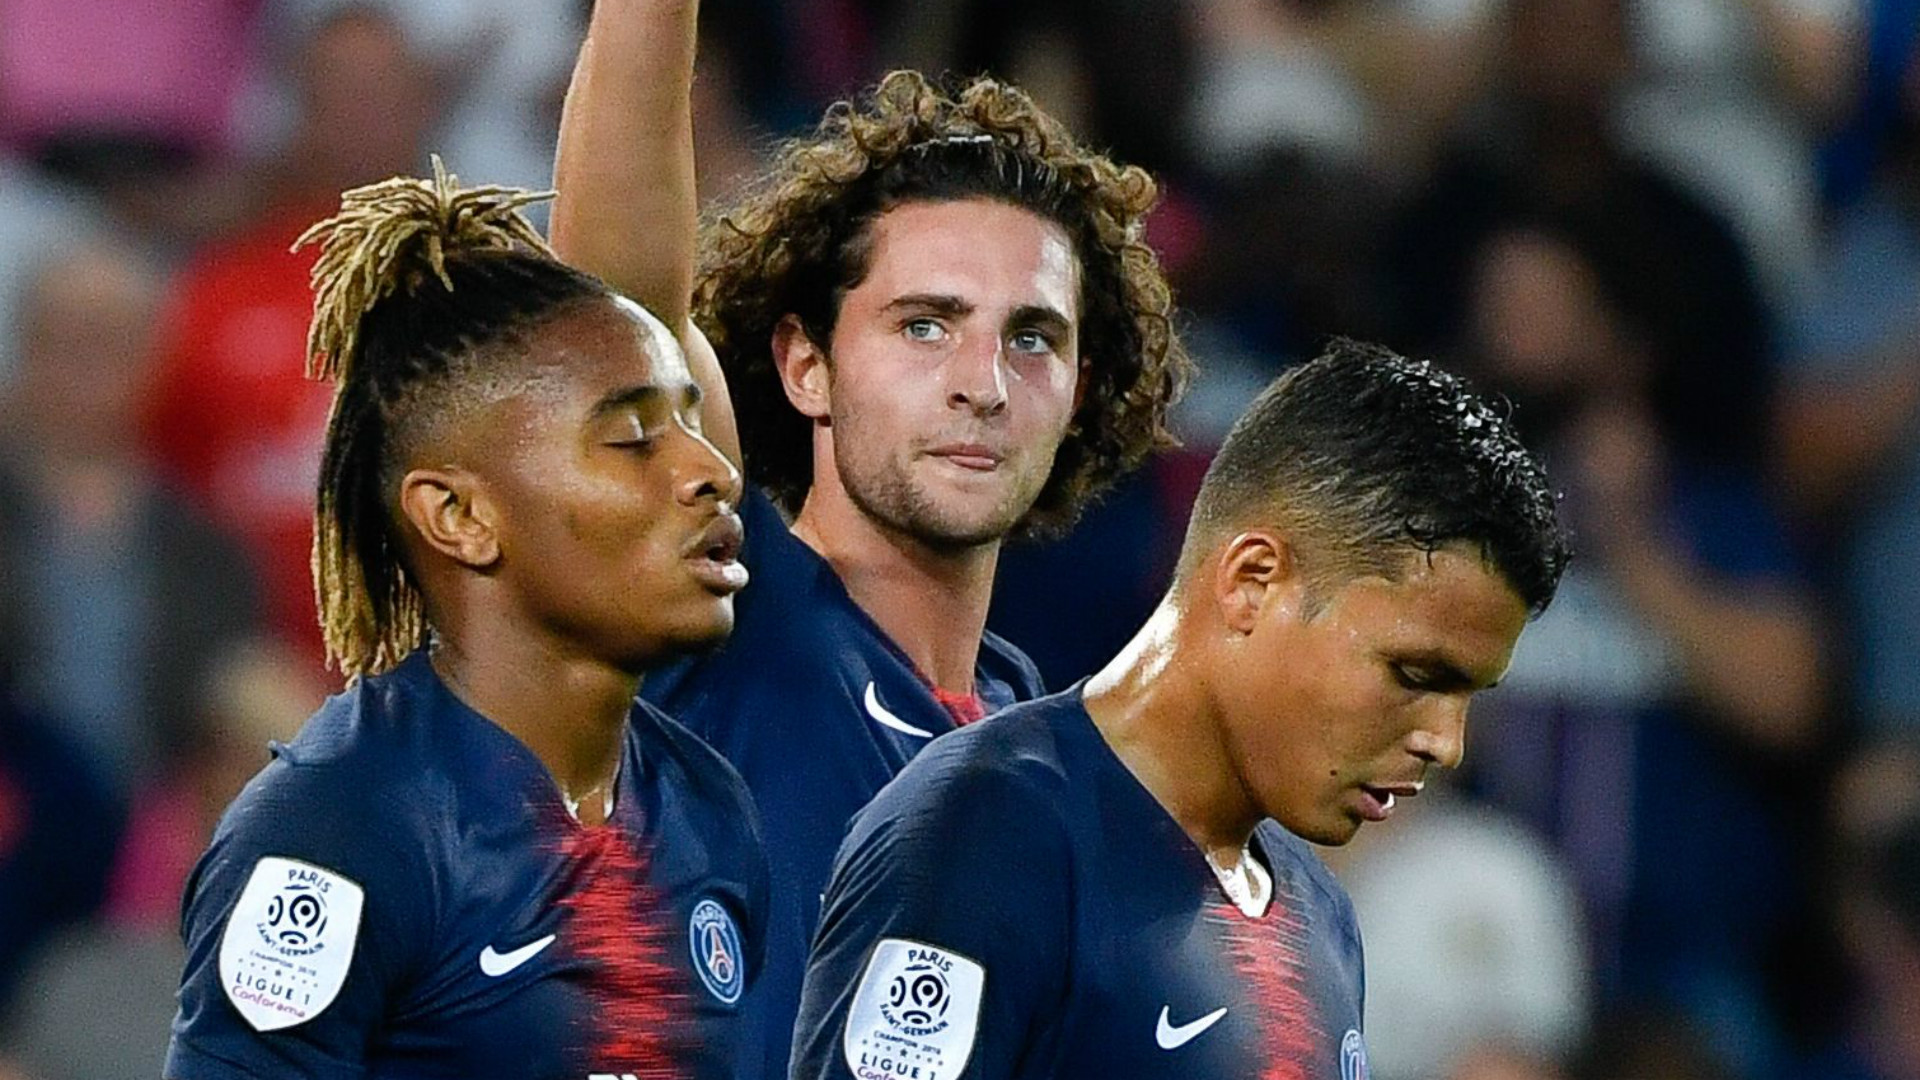 Adrien Rabiot PSG Paris Saint-Germain 2018-19